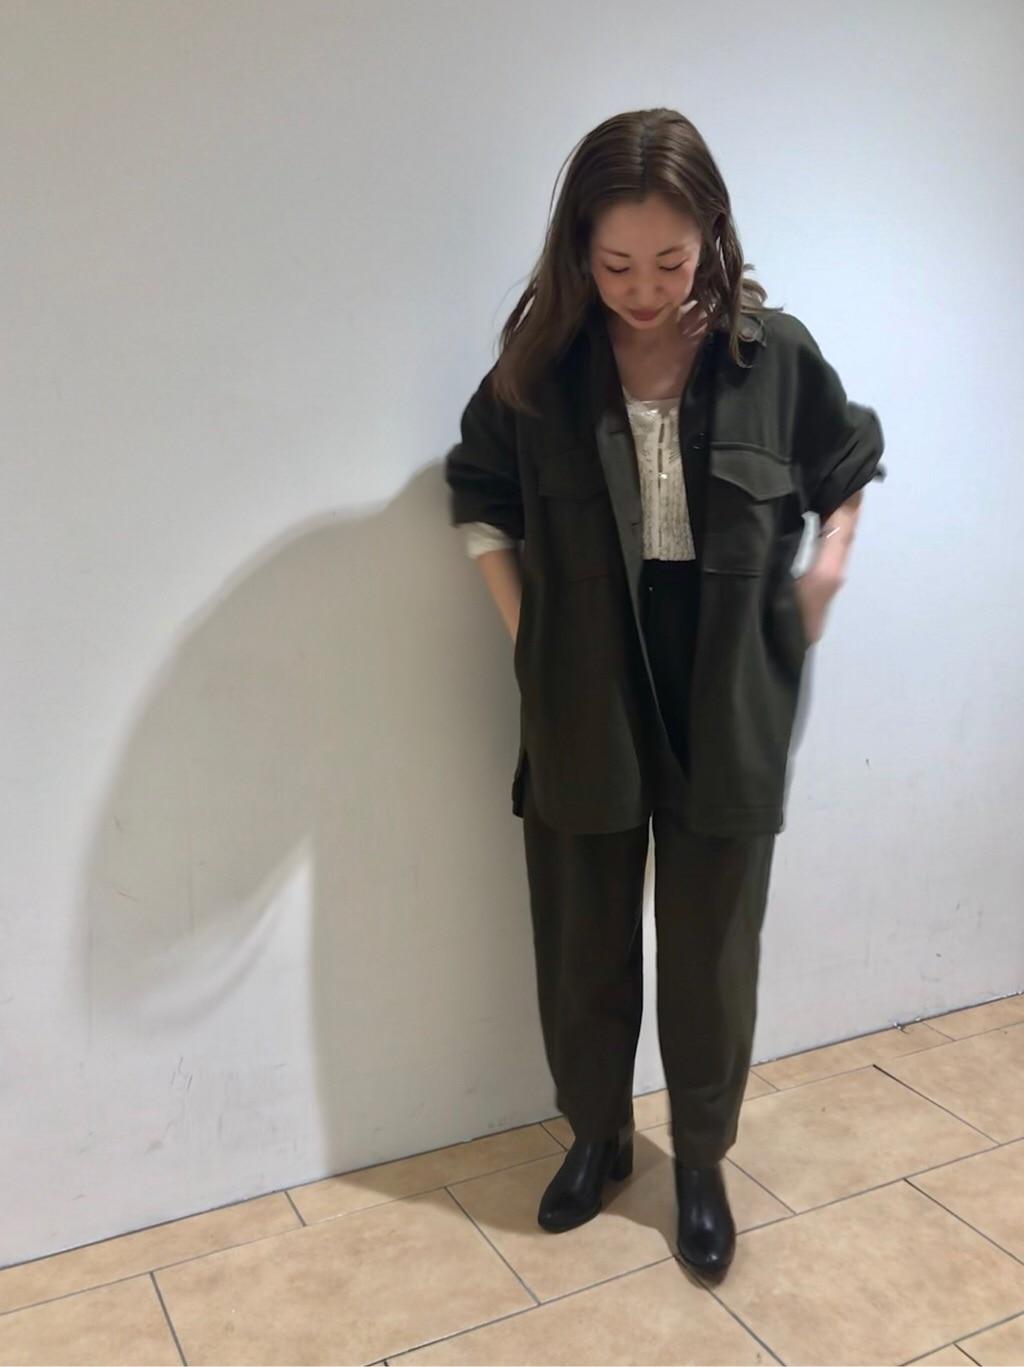 Dot and Stripes CHILD WOMAN ペリエ千葉 身長:155cm 2019.10.07